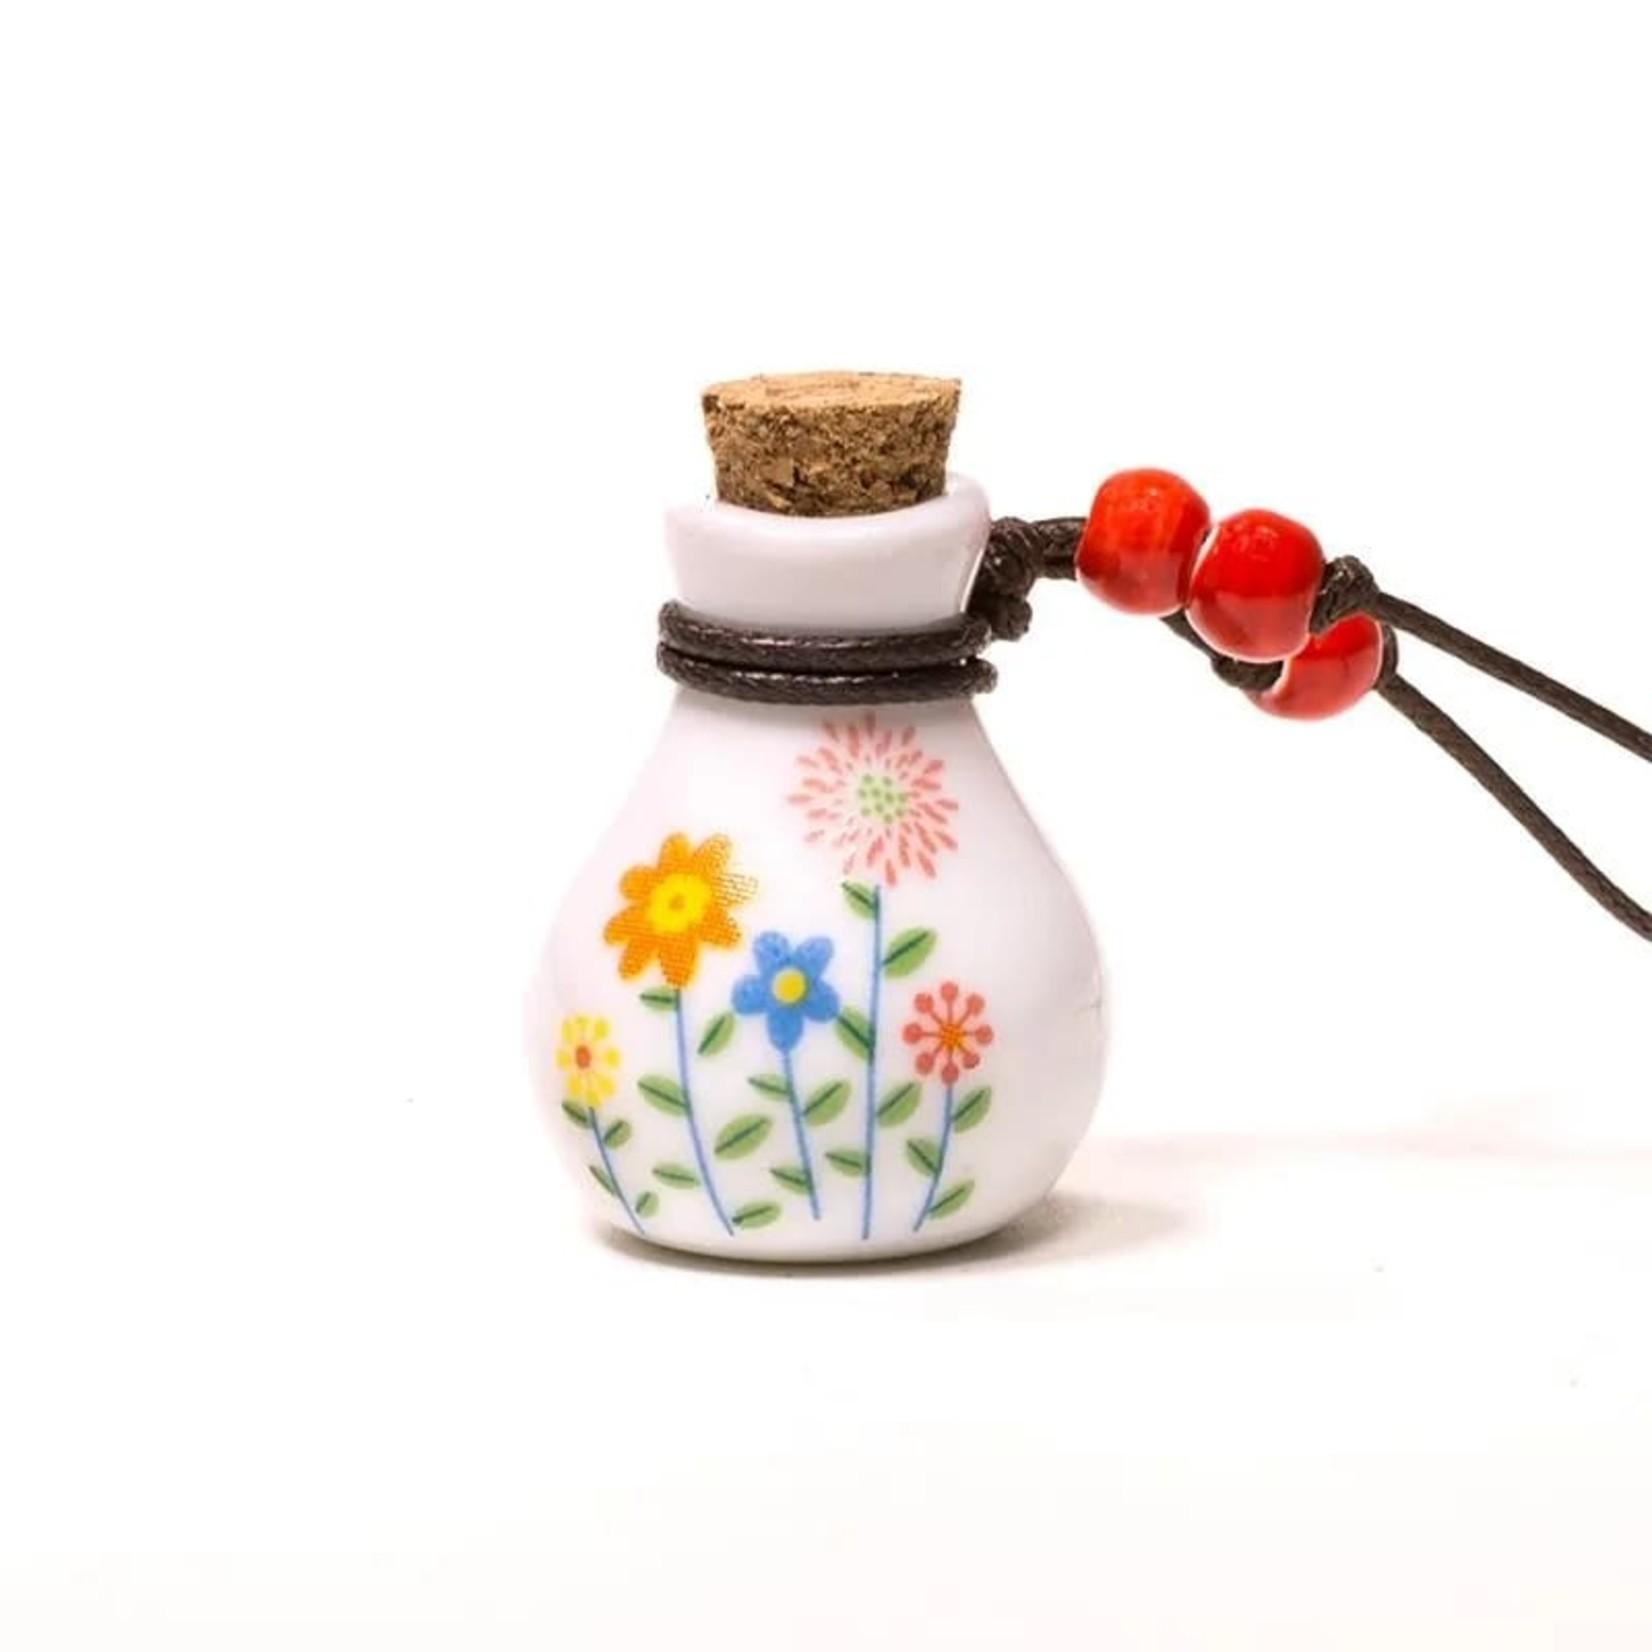 Klein lief kruikje - verspreidt subtiel aromatherapie!